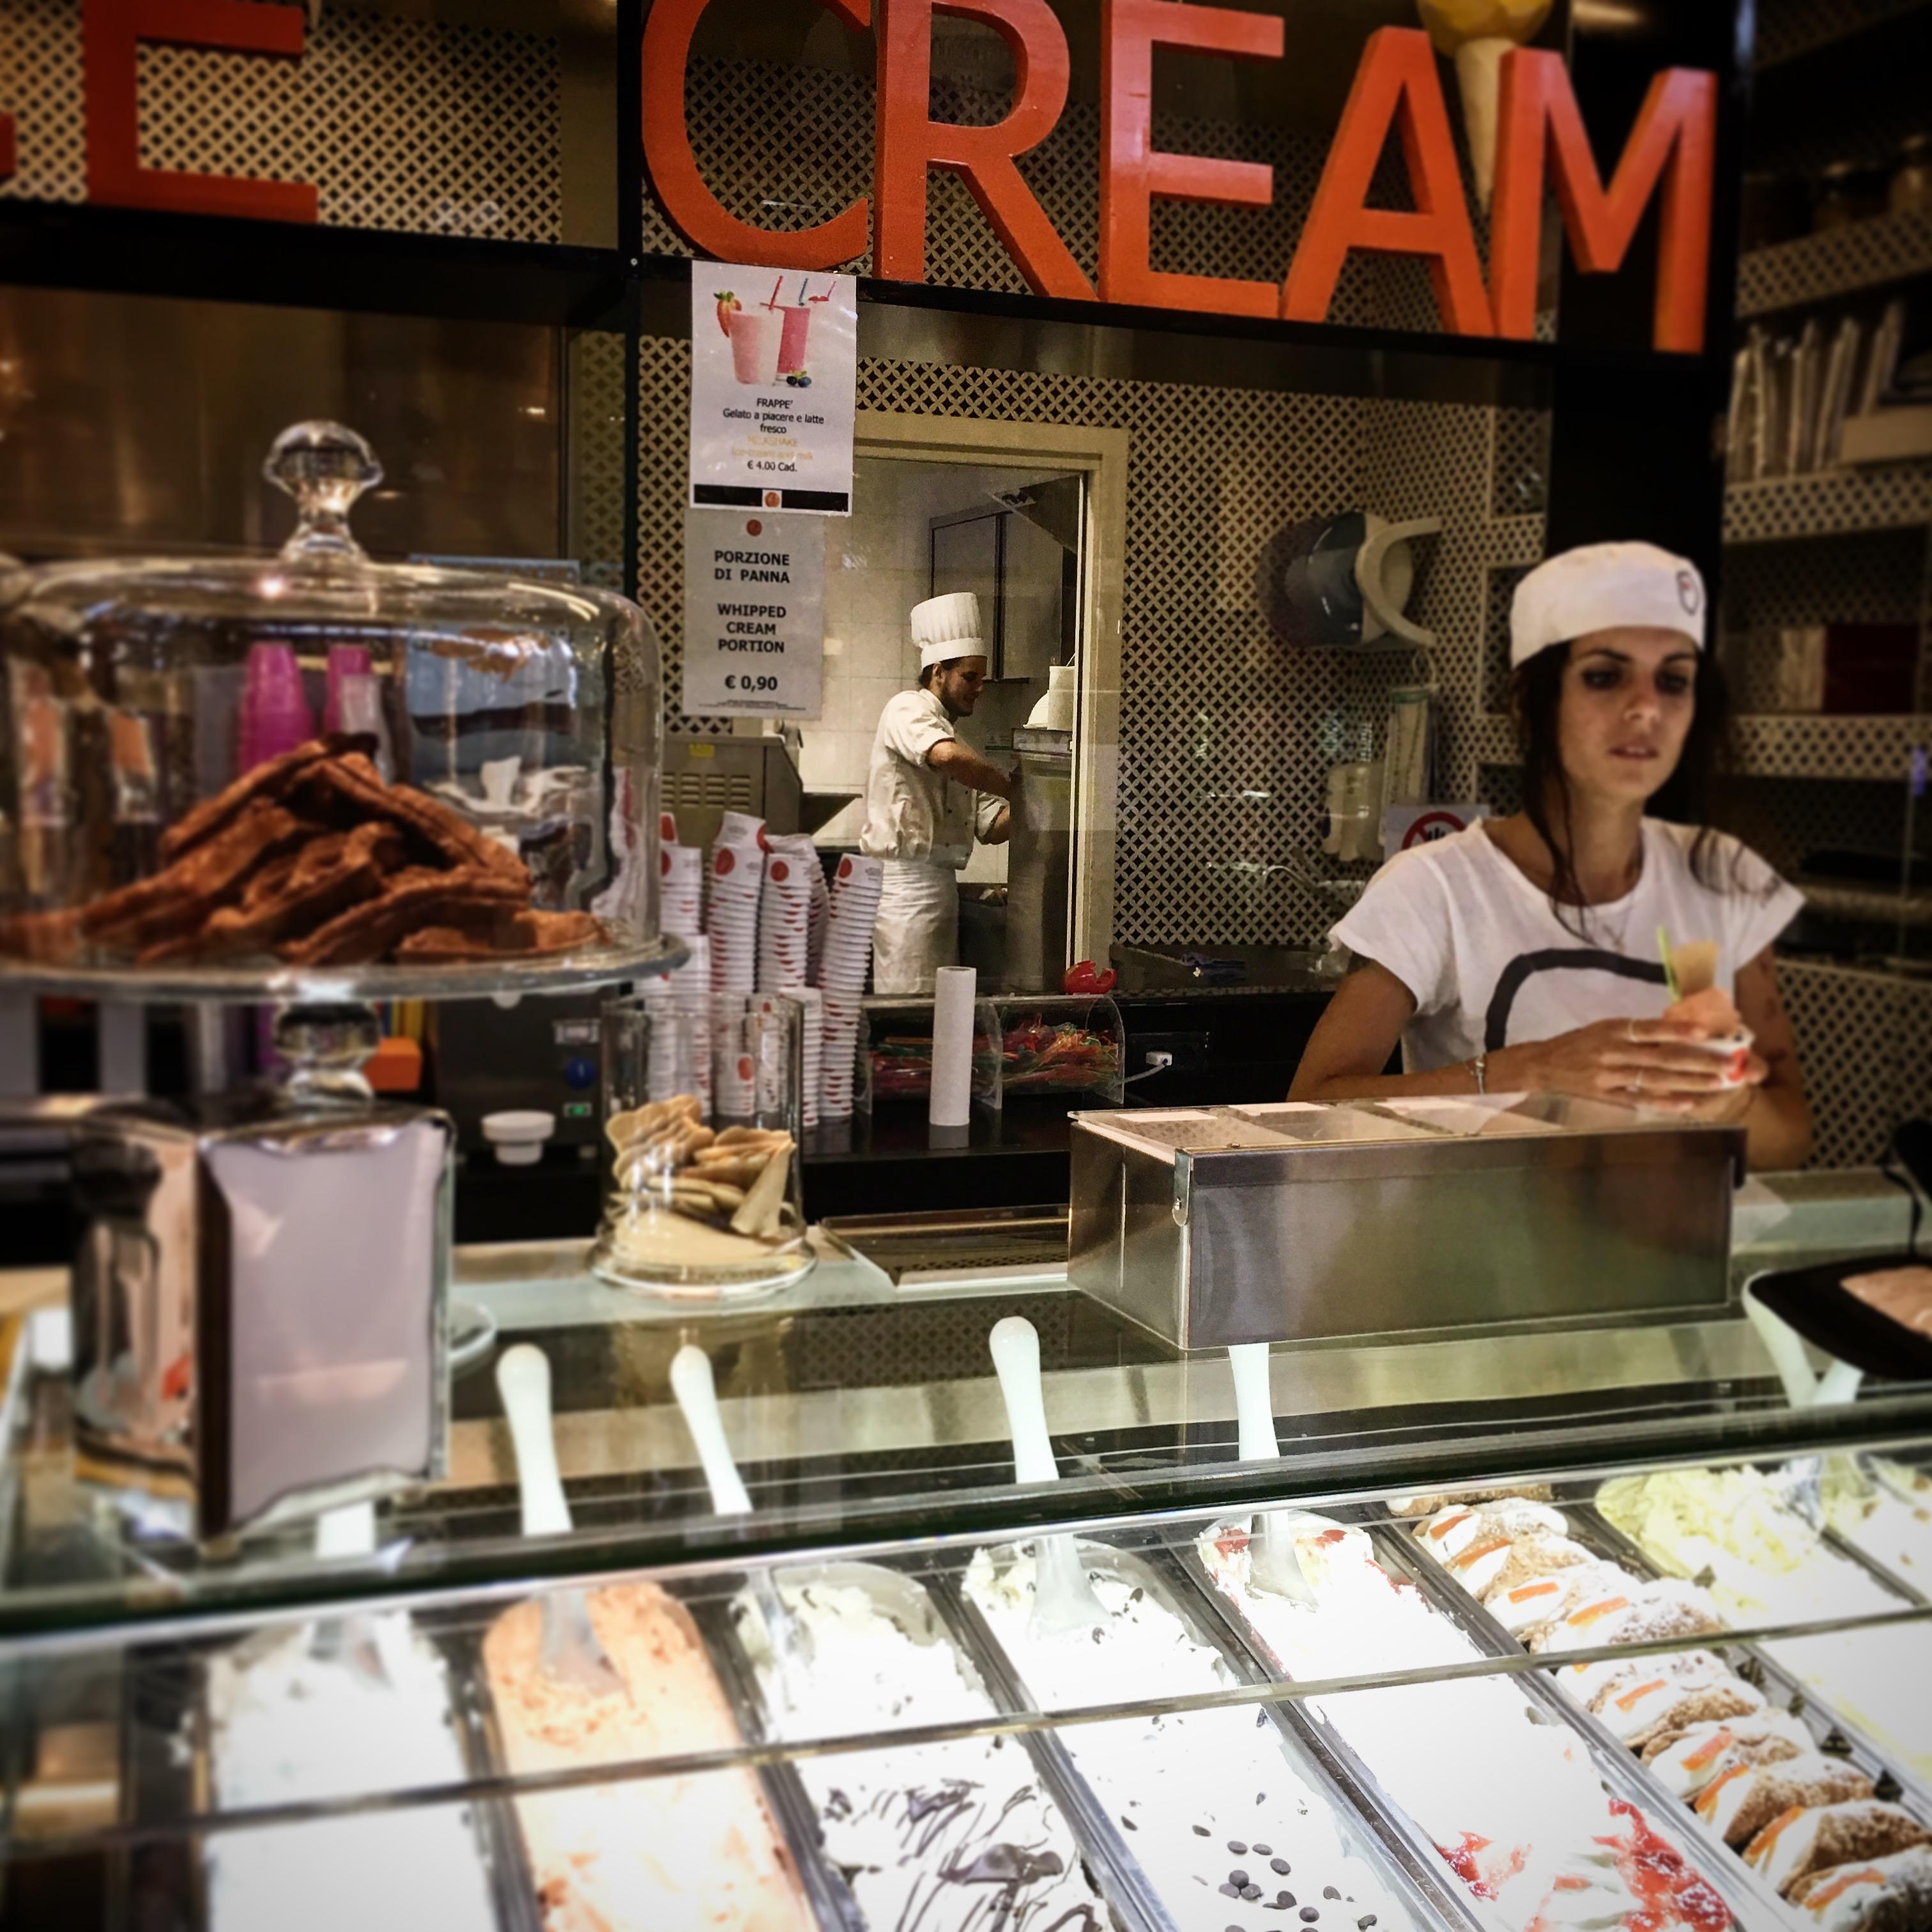 mercato-centrale-firenze-gelati